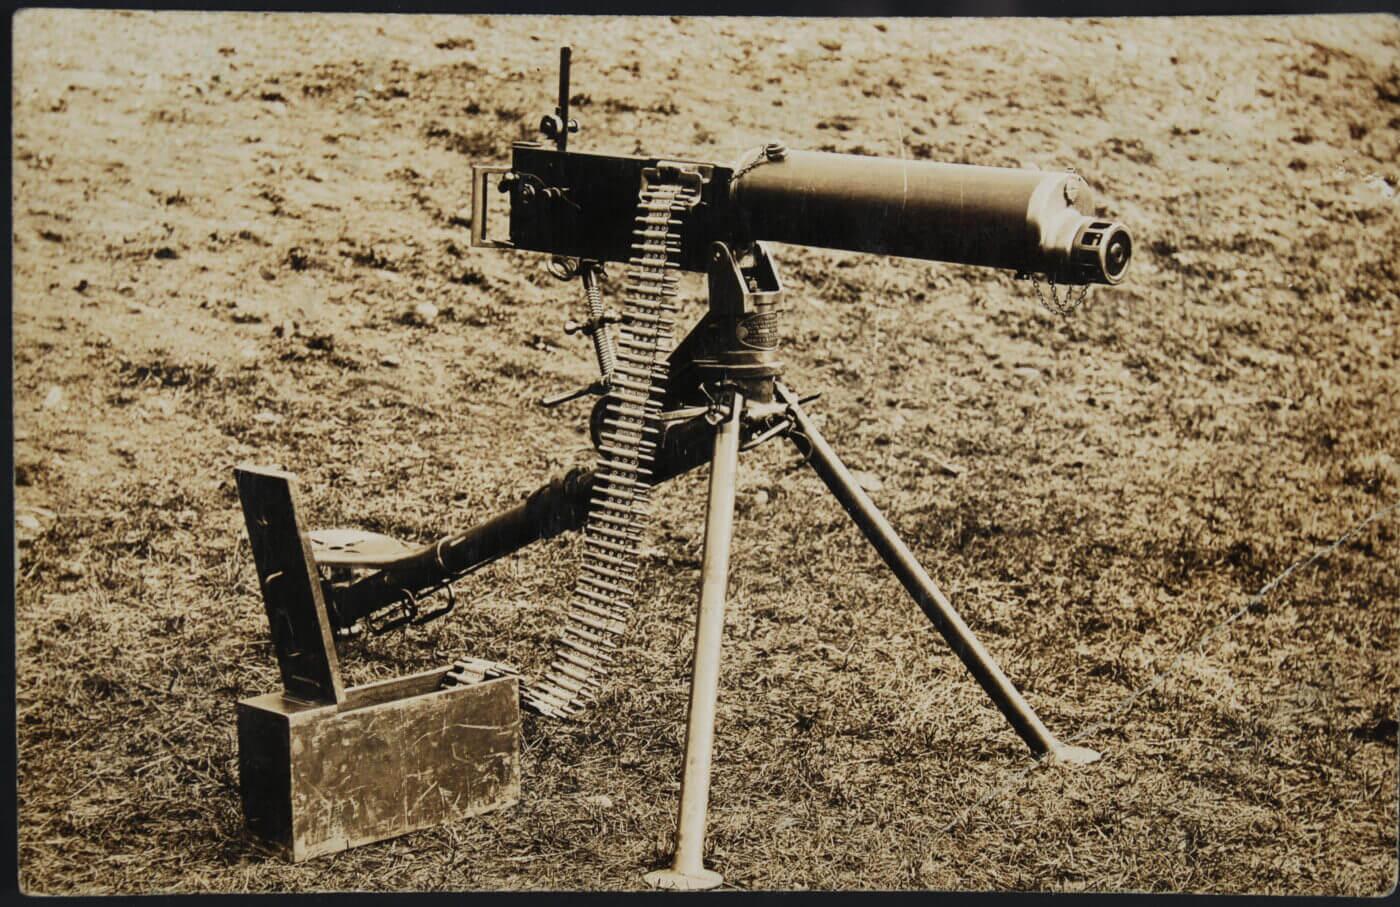 Vickers machine gun on tripod